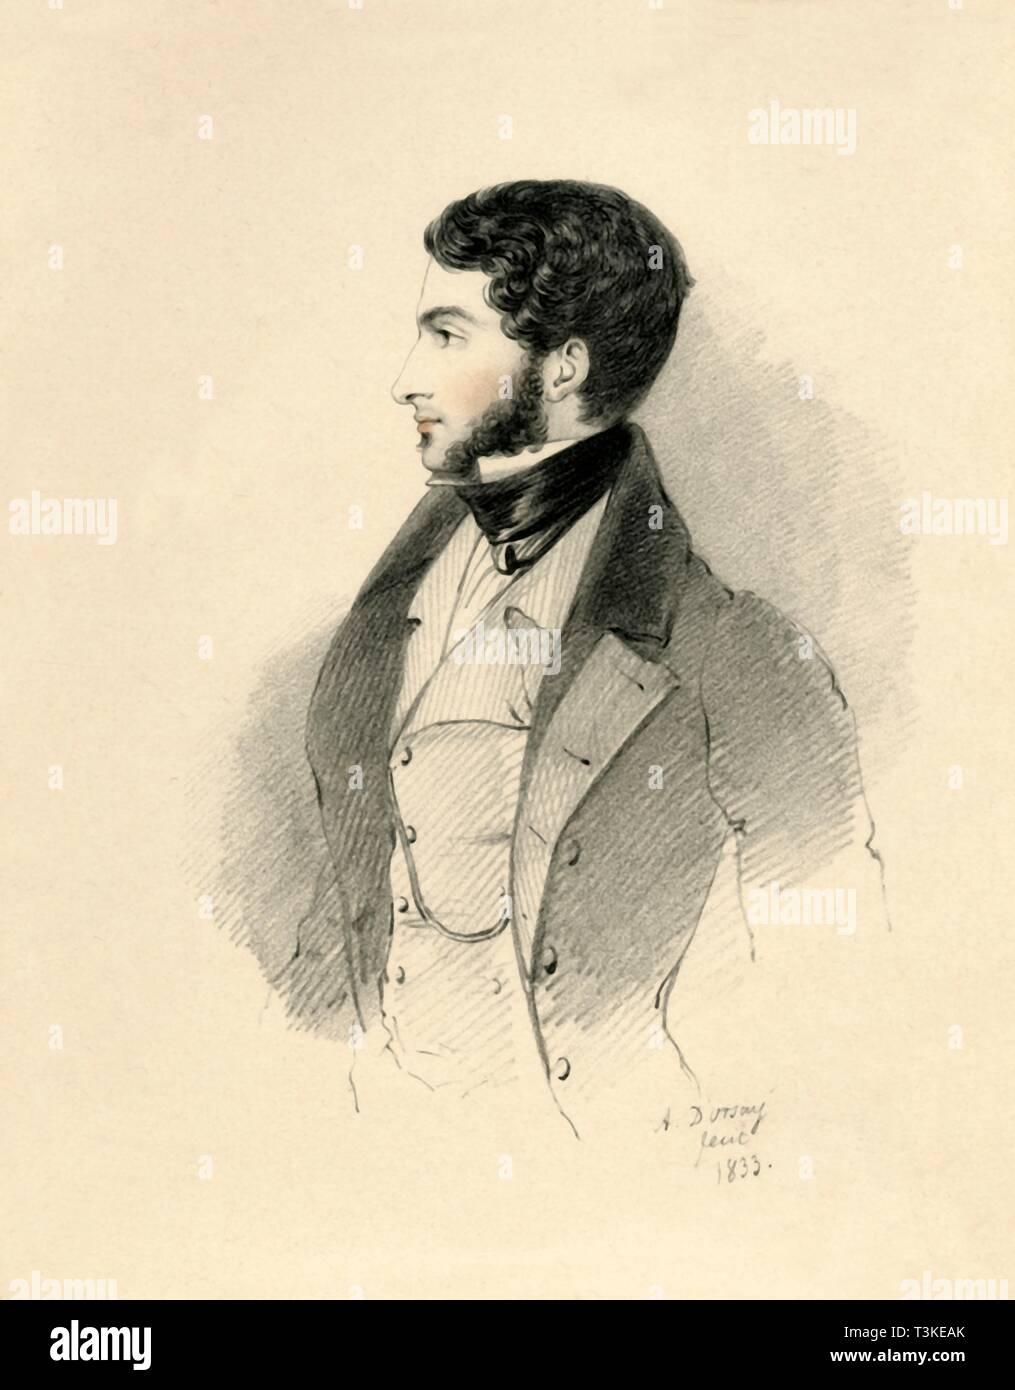 'The Honourable George Byng M.P. afterwards Viscount Enfield, 1833. Creator: Richard James Lane. Stock Photo